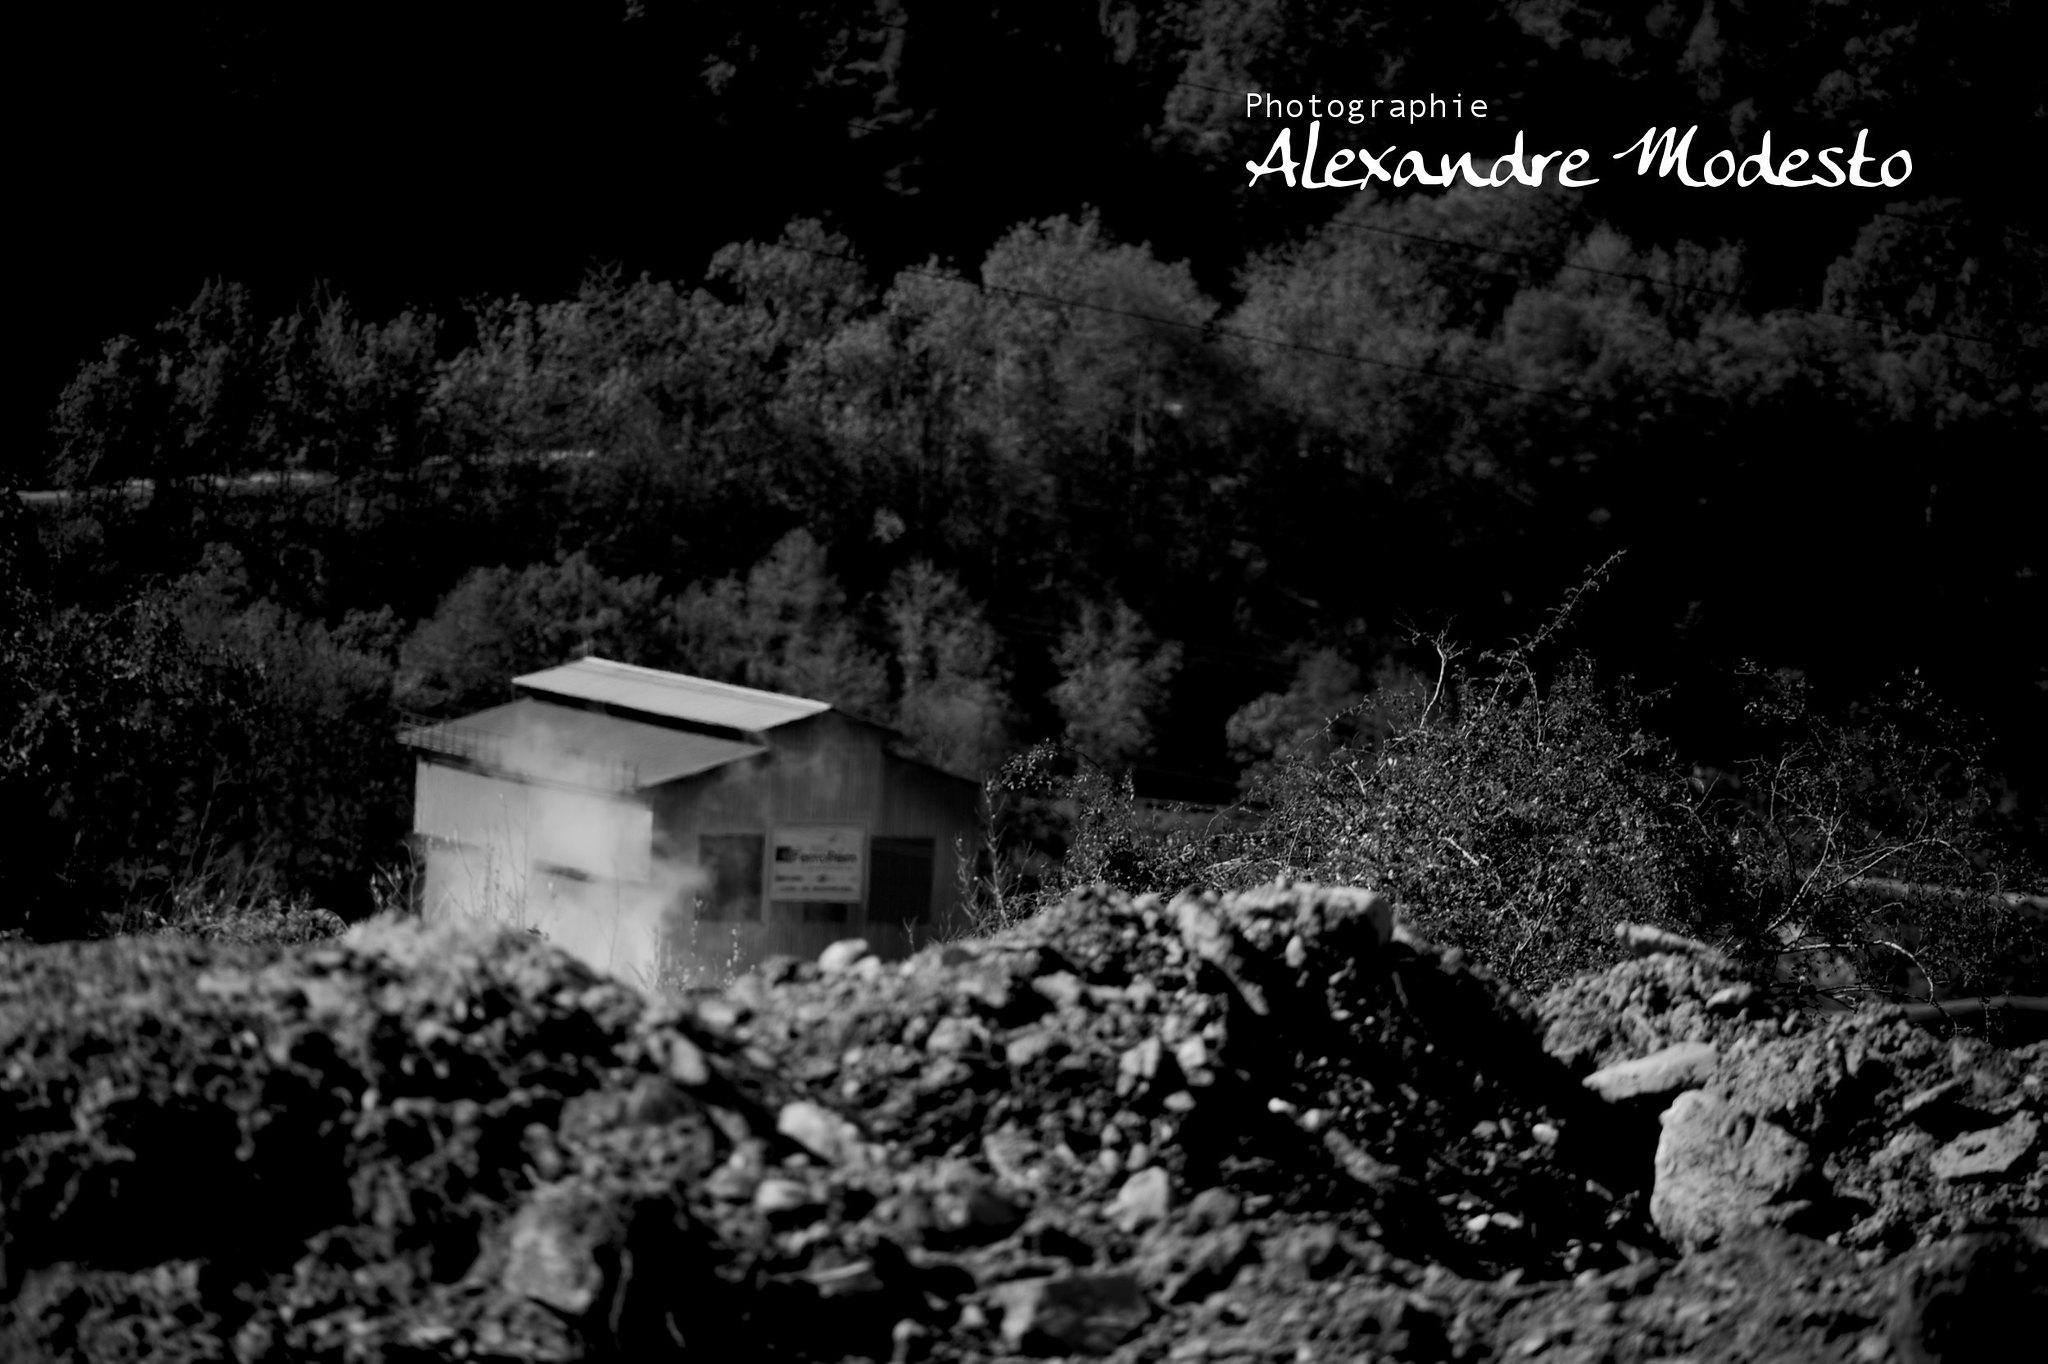 Ferropem Montricher Explore Modesto Alexandre 39 S Photos